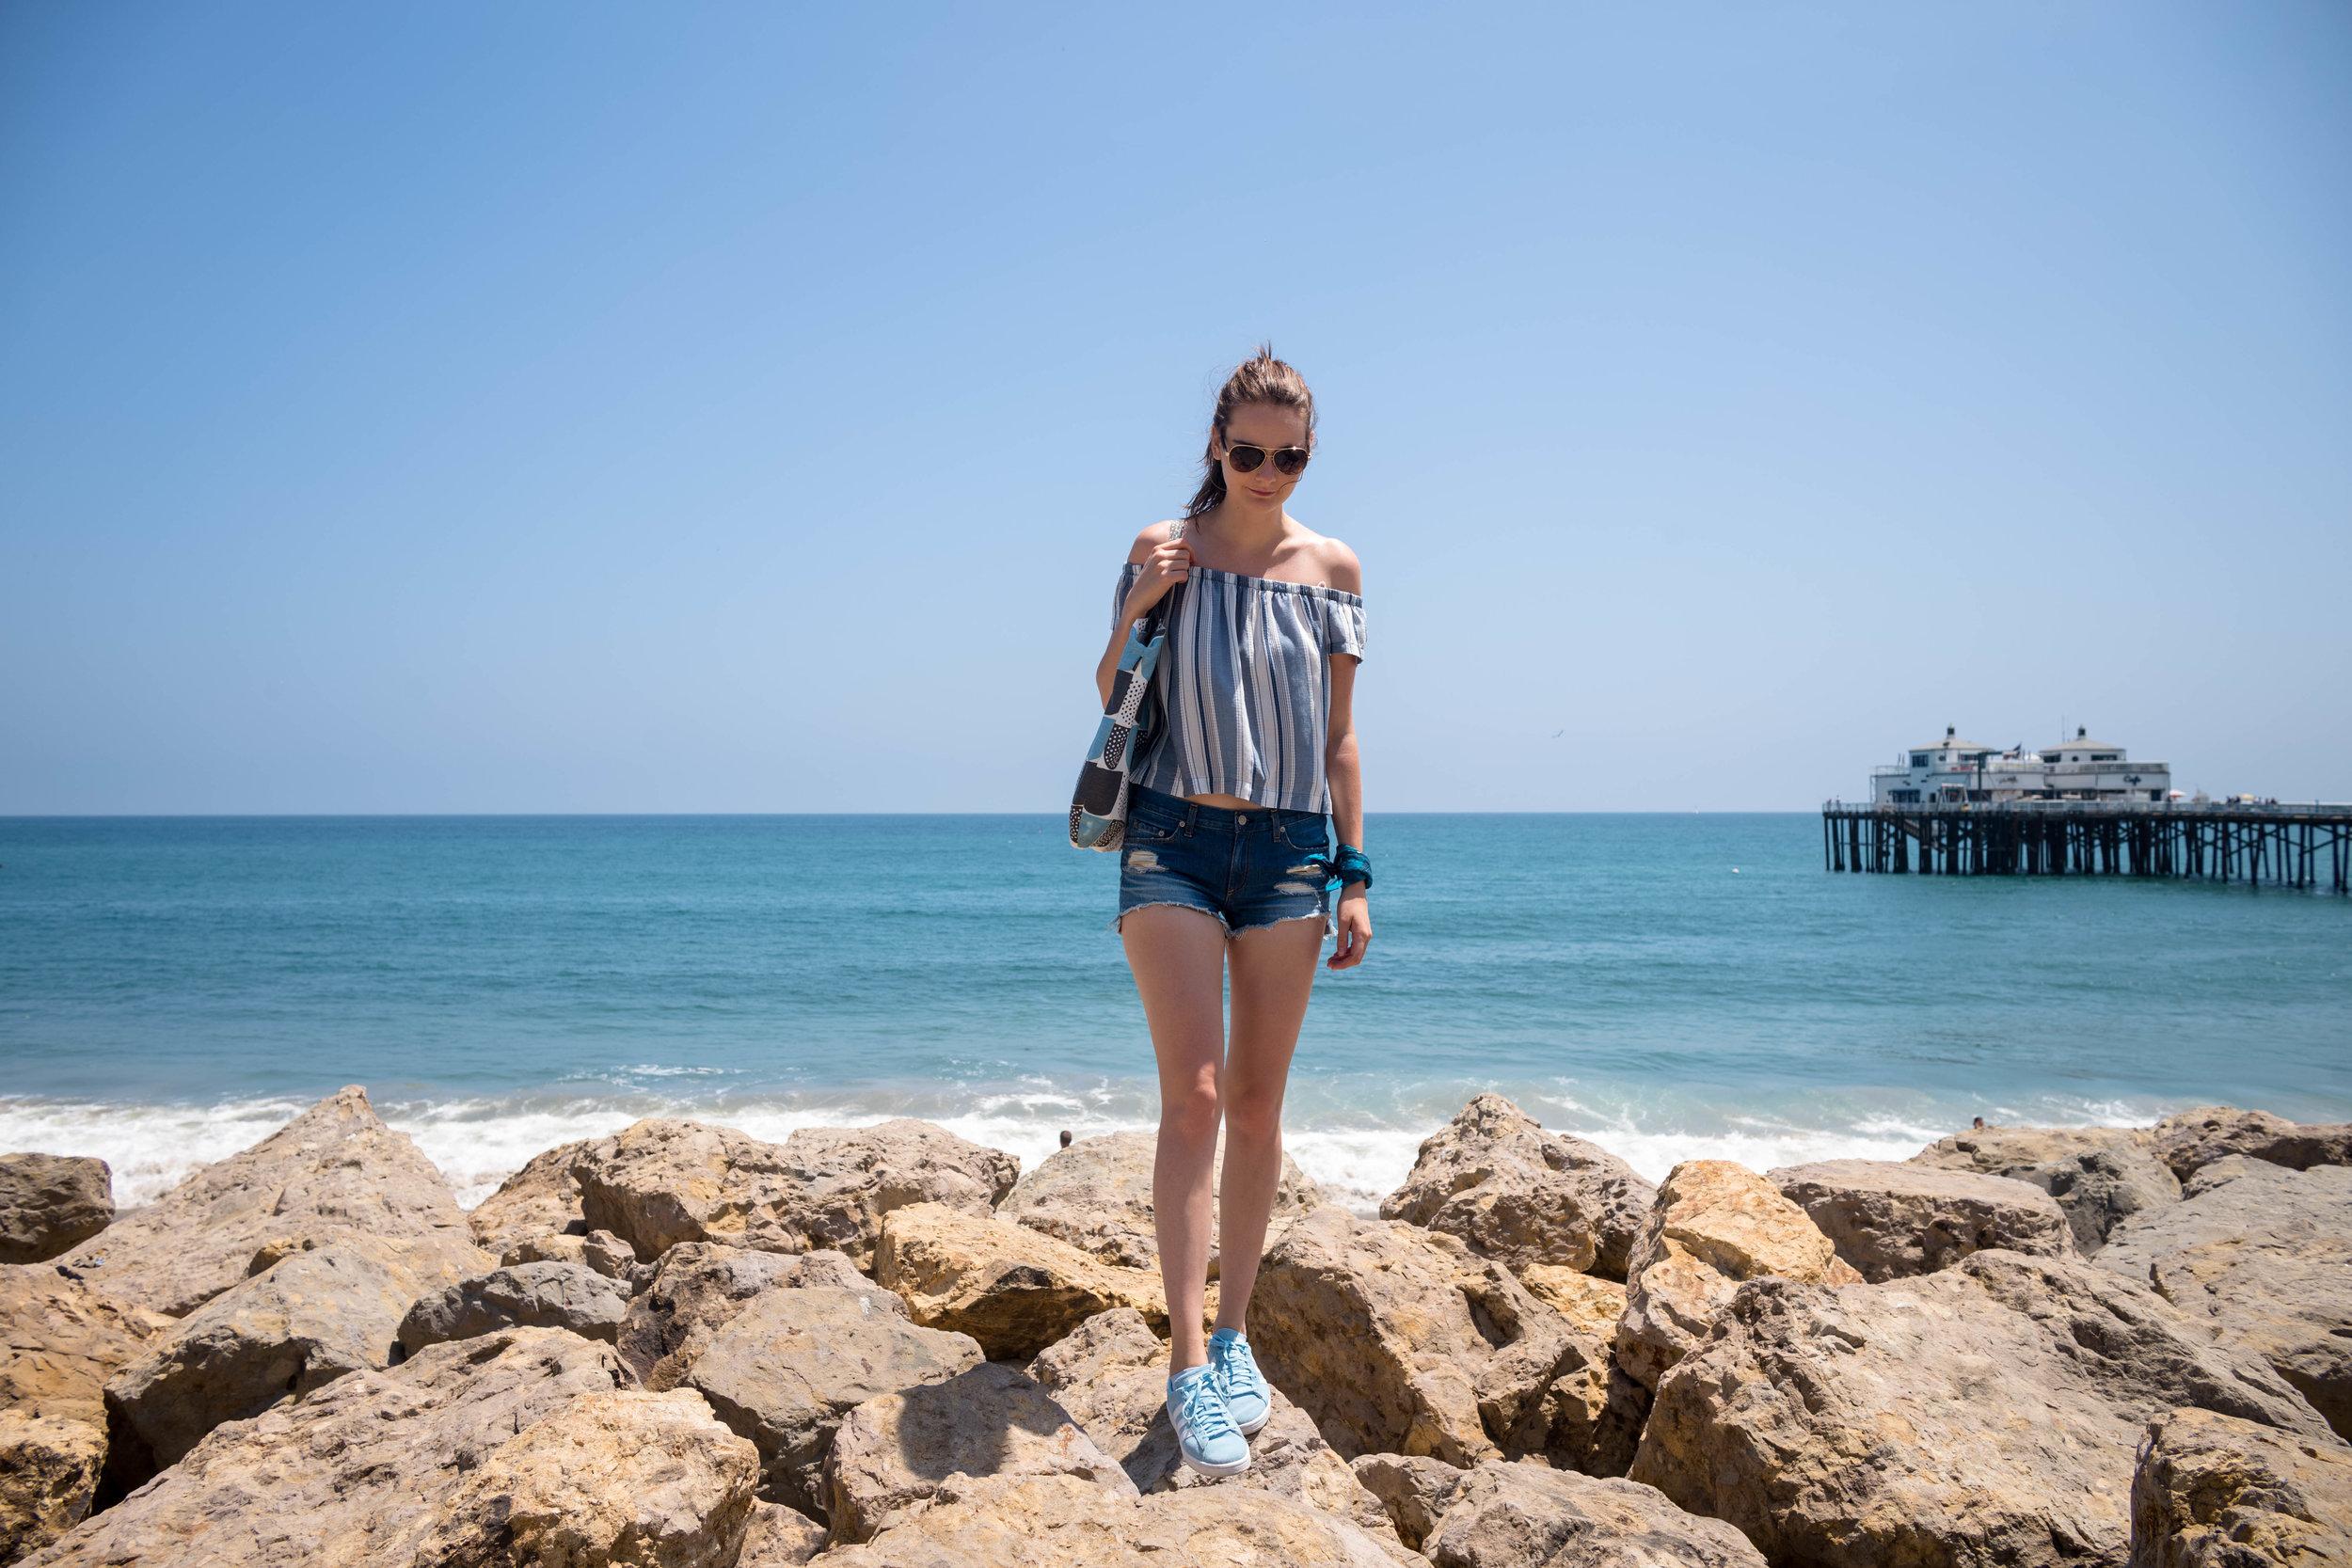 At Malibu Beach. Leica 28mm f/1.4 Summilux ASPH